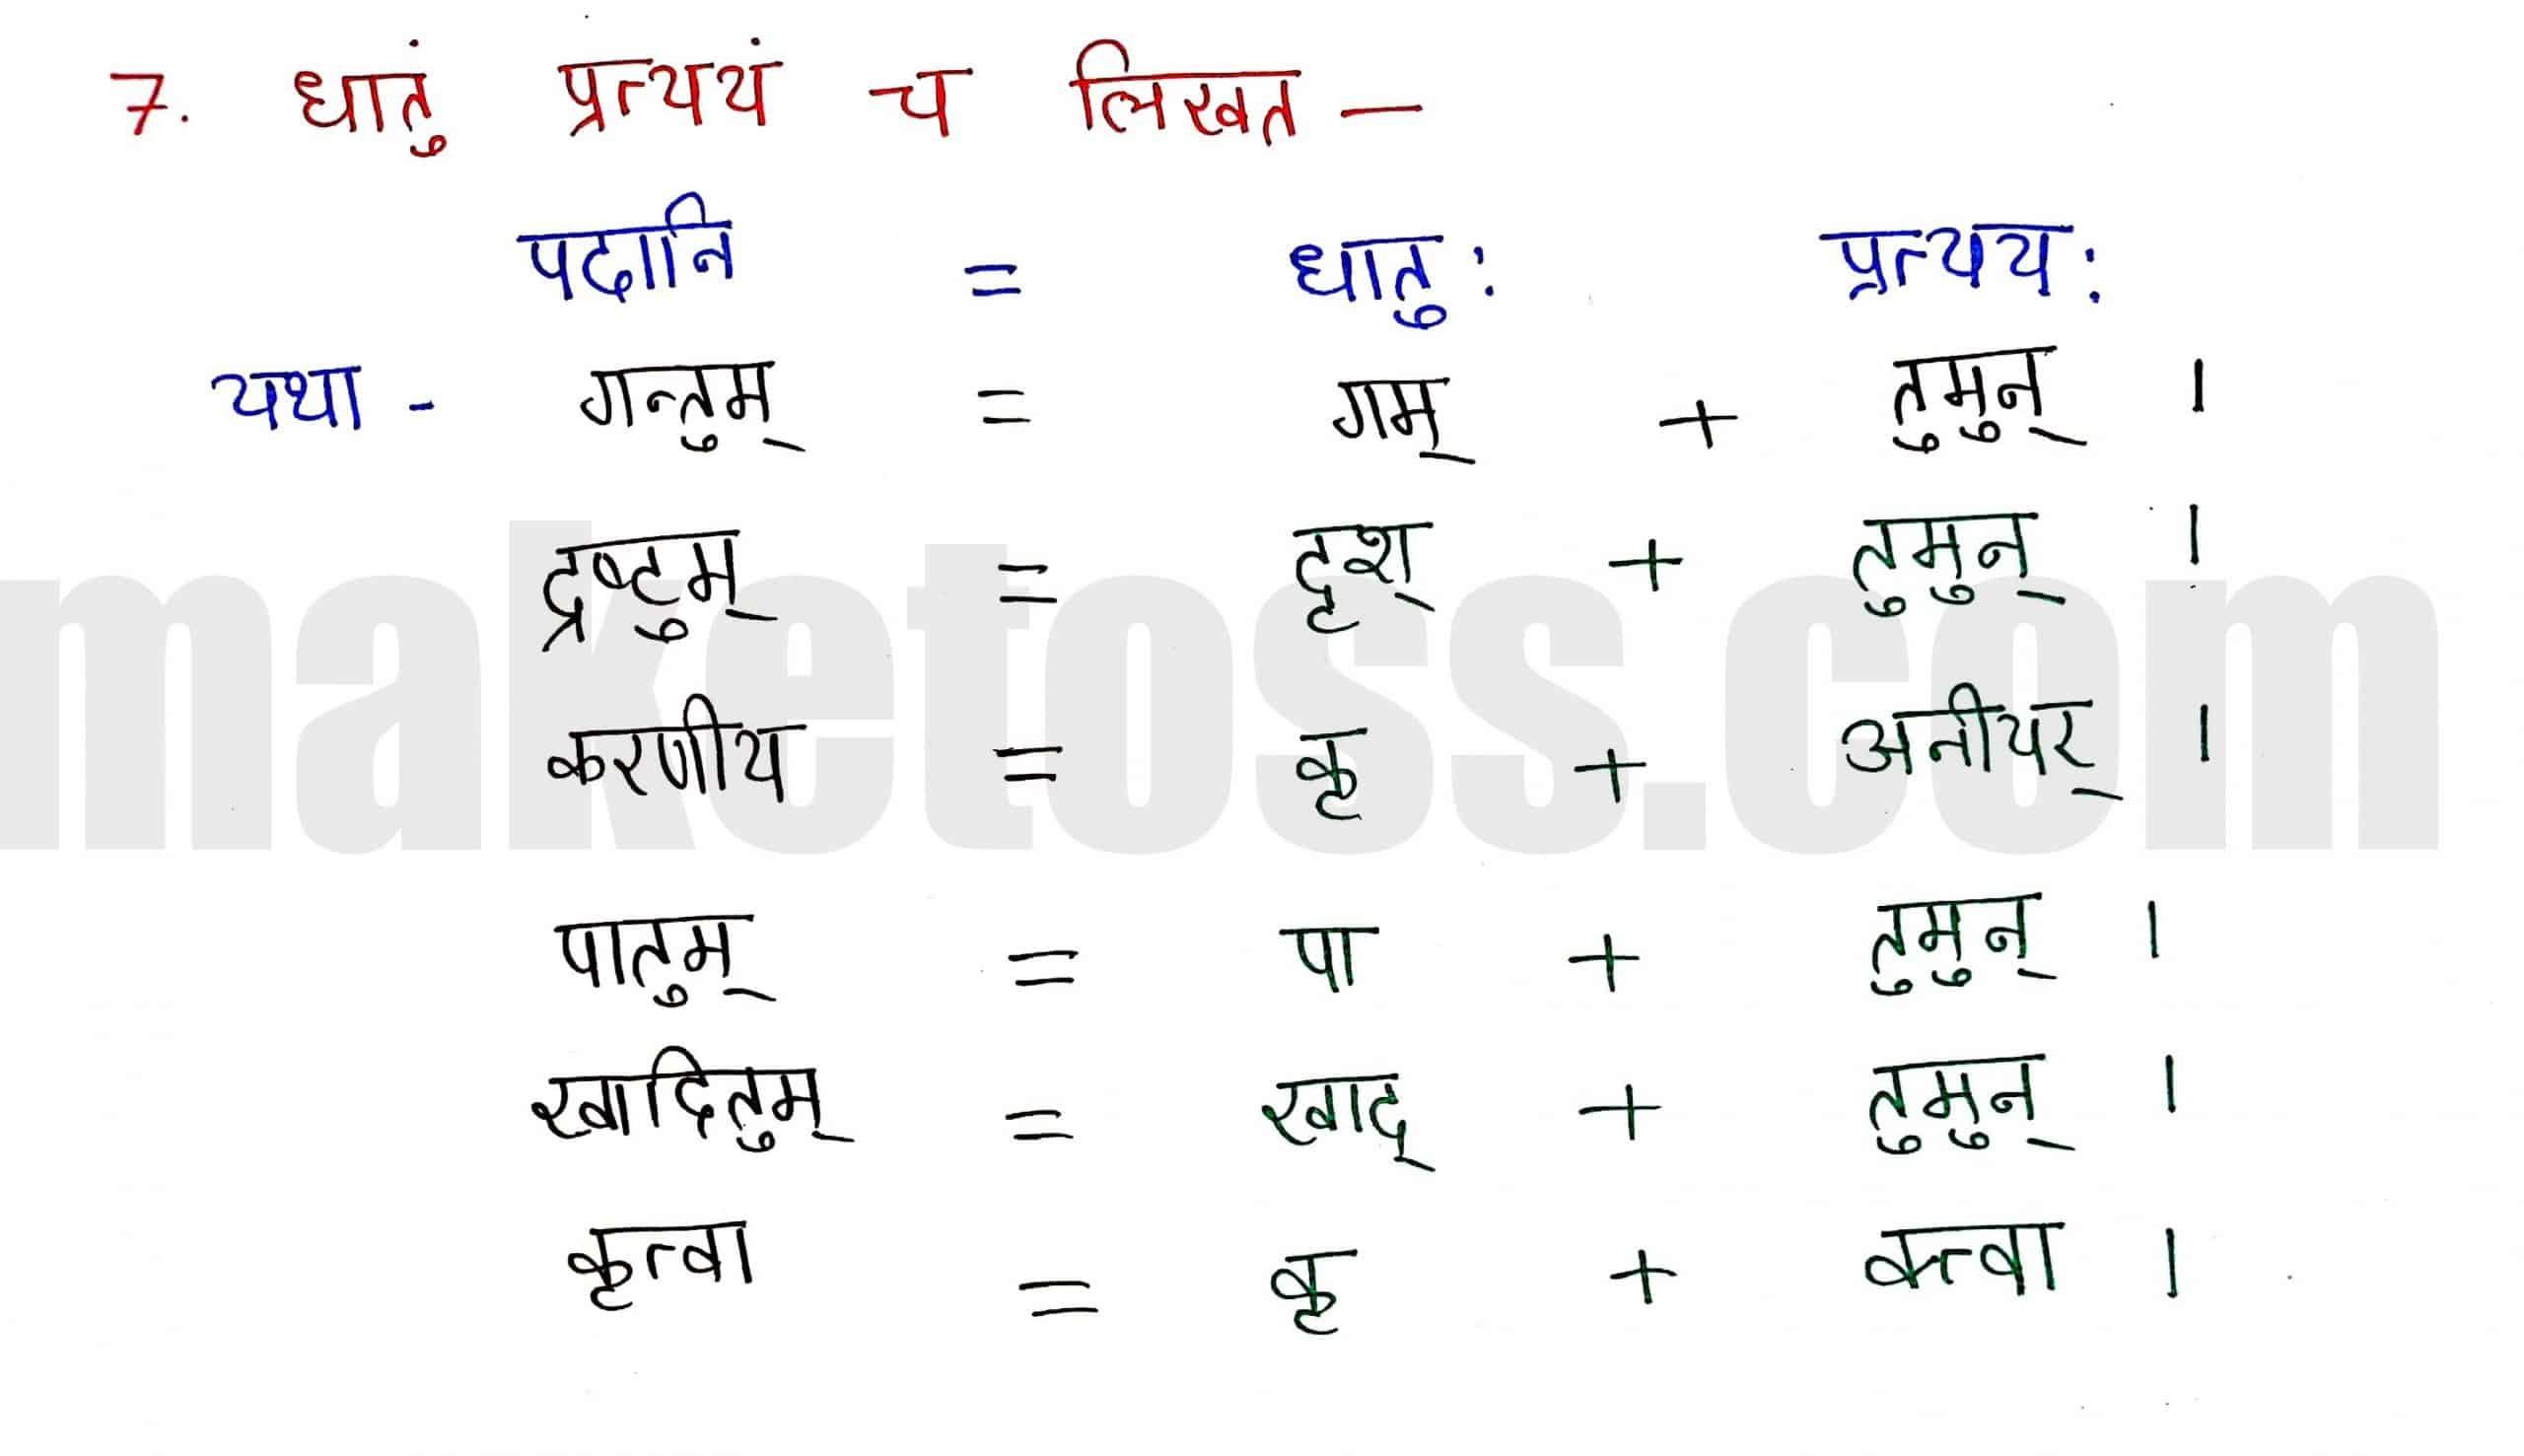 Sanskrit Class 8-chapter 5-धर्मे धमनं पापे पुण्यम् -page 6